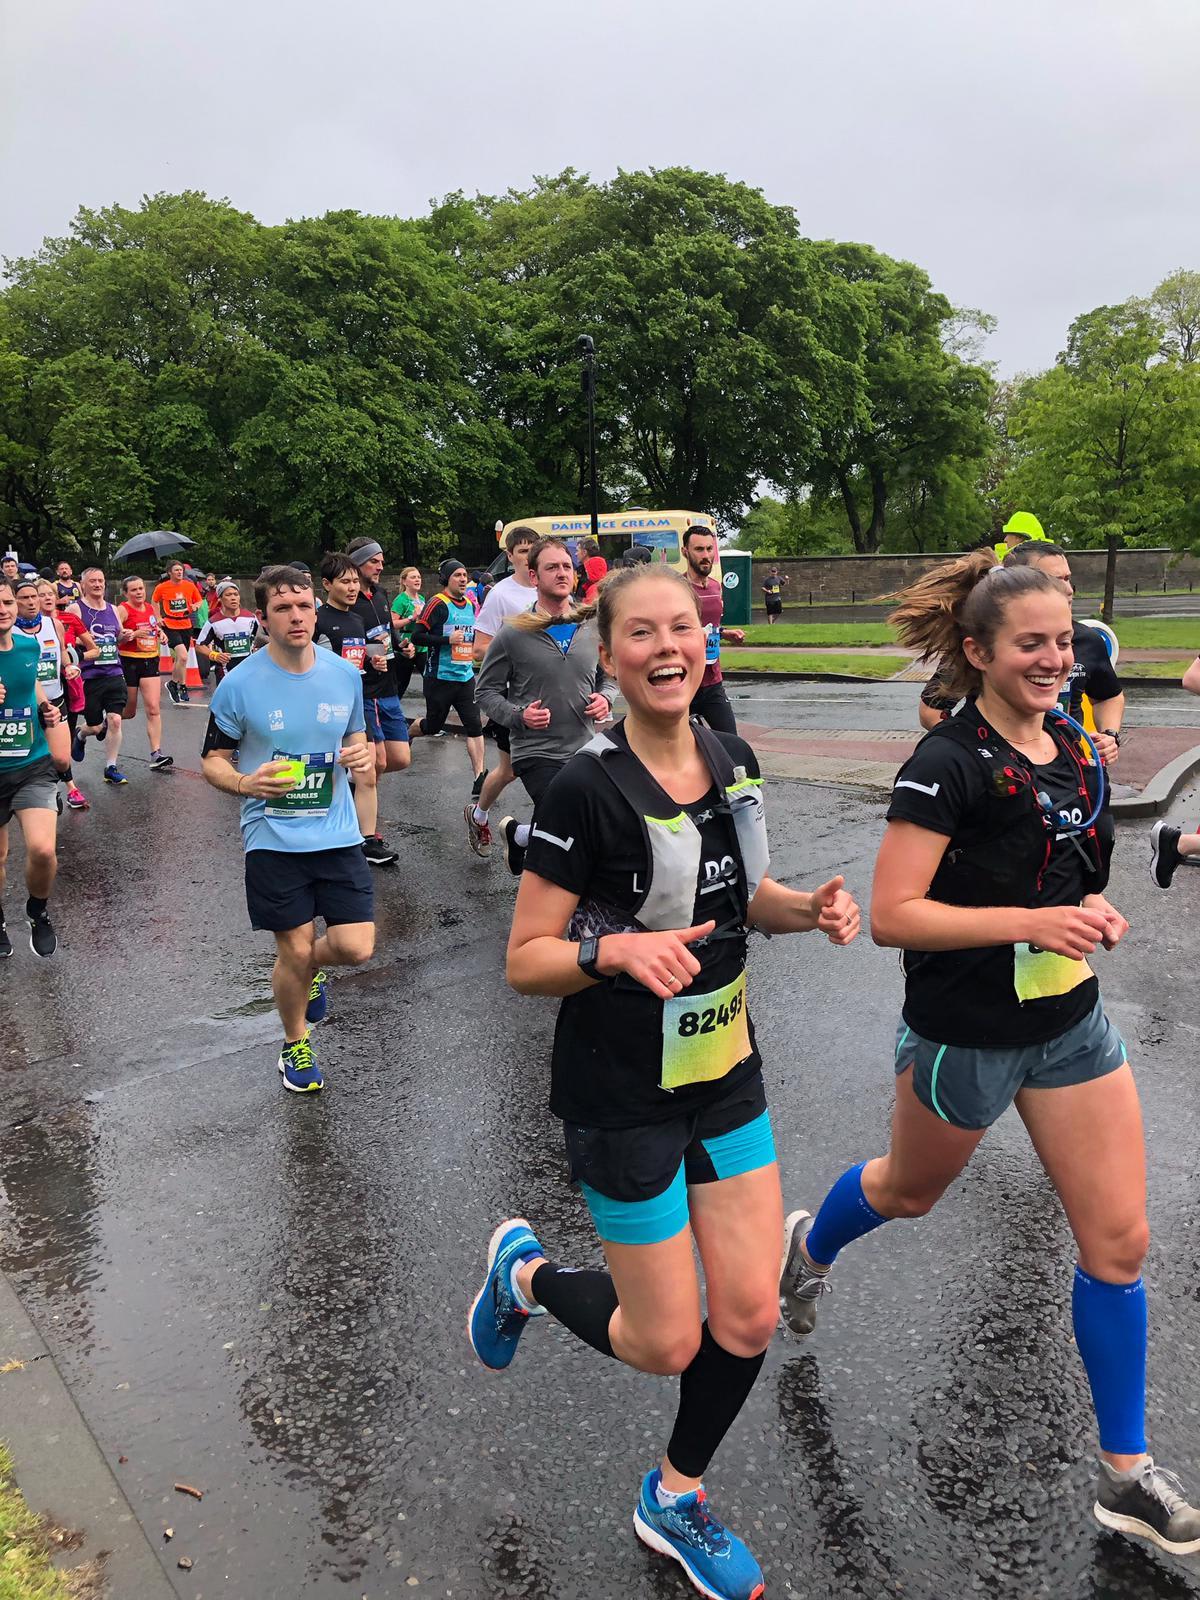 Edinburgh Marathon Festival - Marathon & Half Marathon